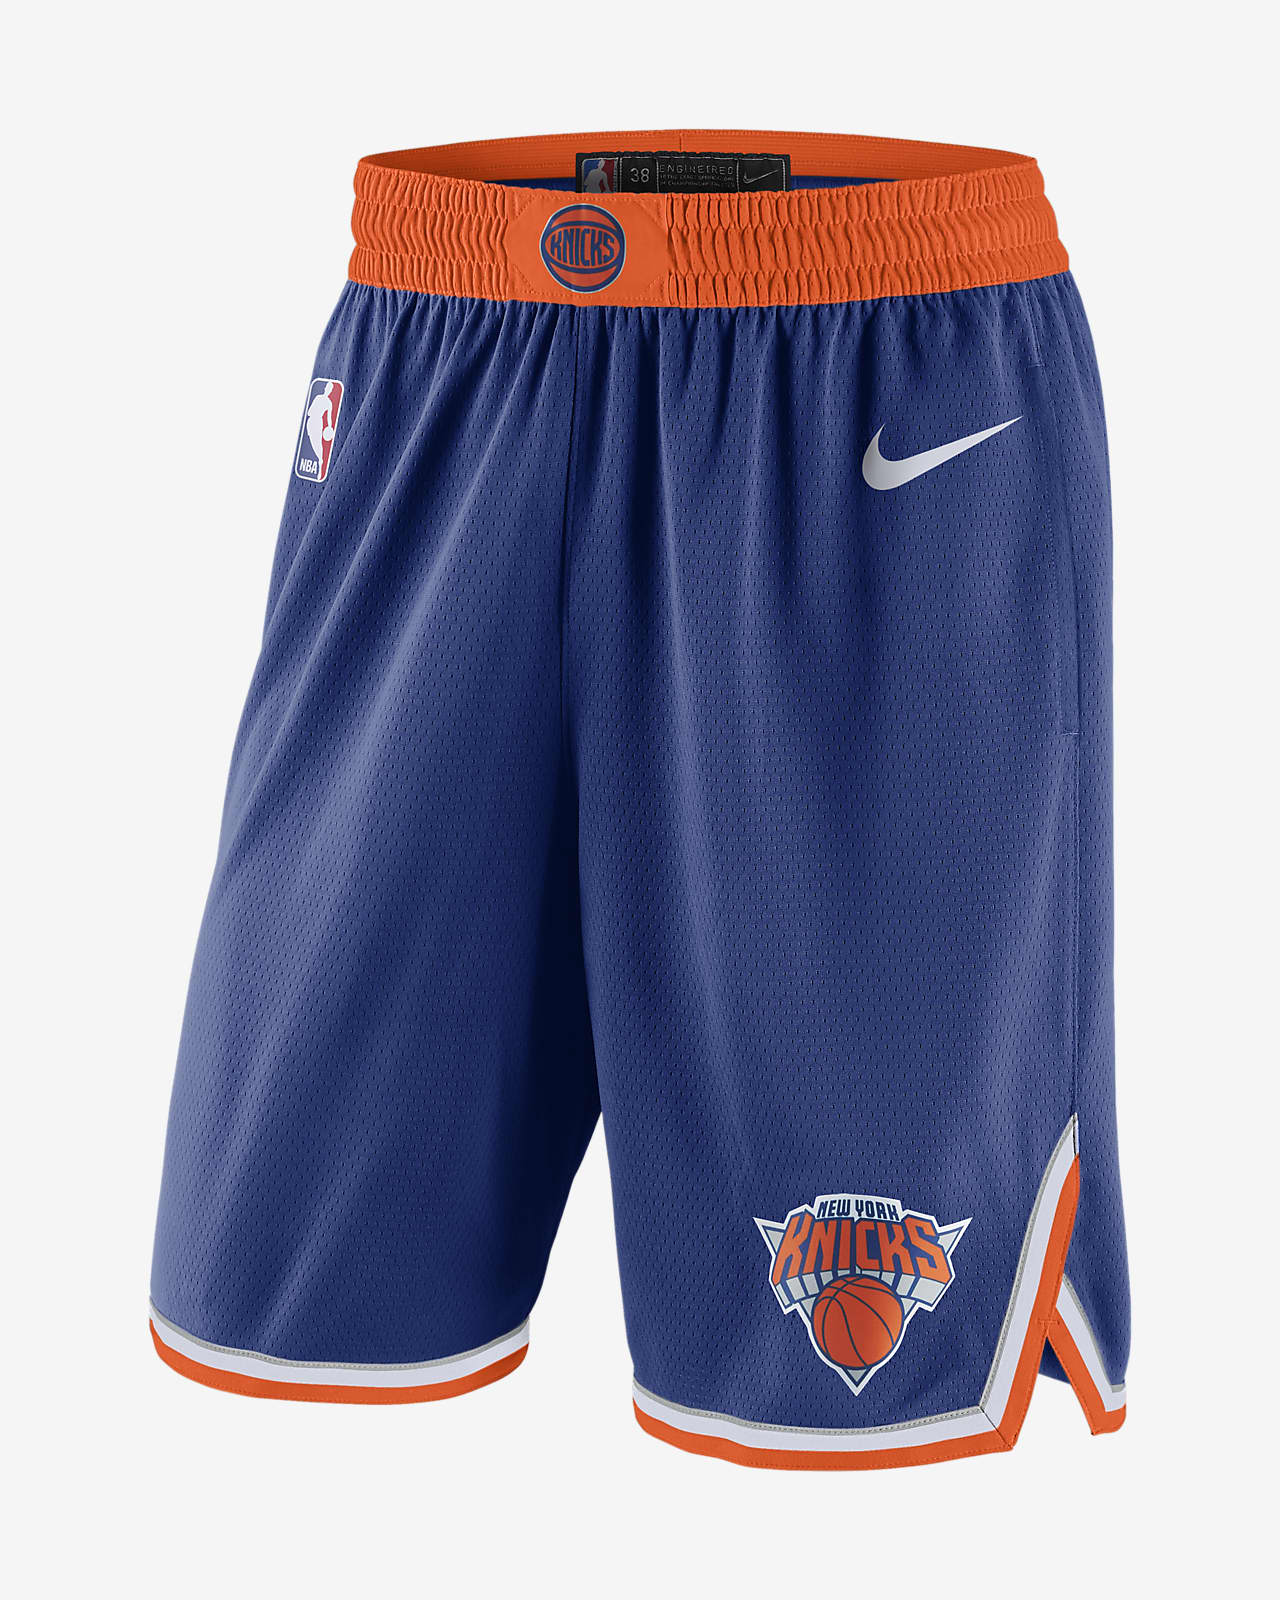 New York Knicks Icon Edition Men's Nike NBA Swingman Shorts